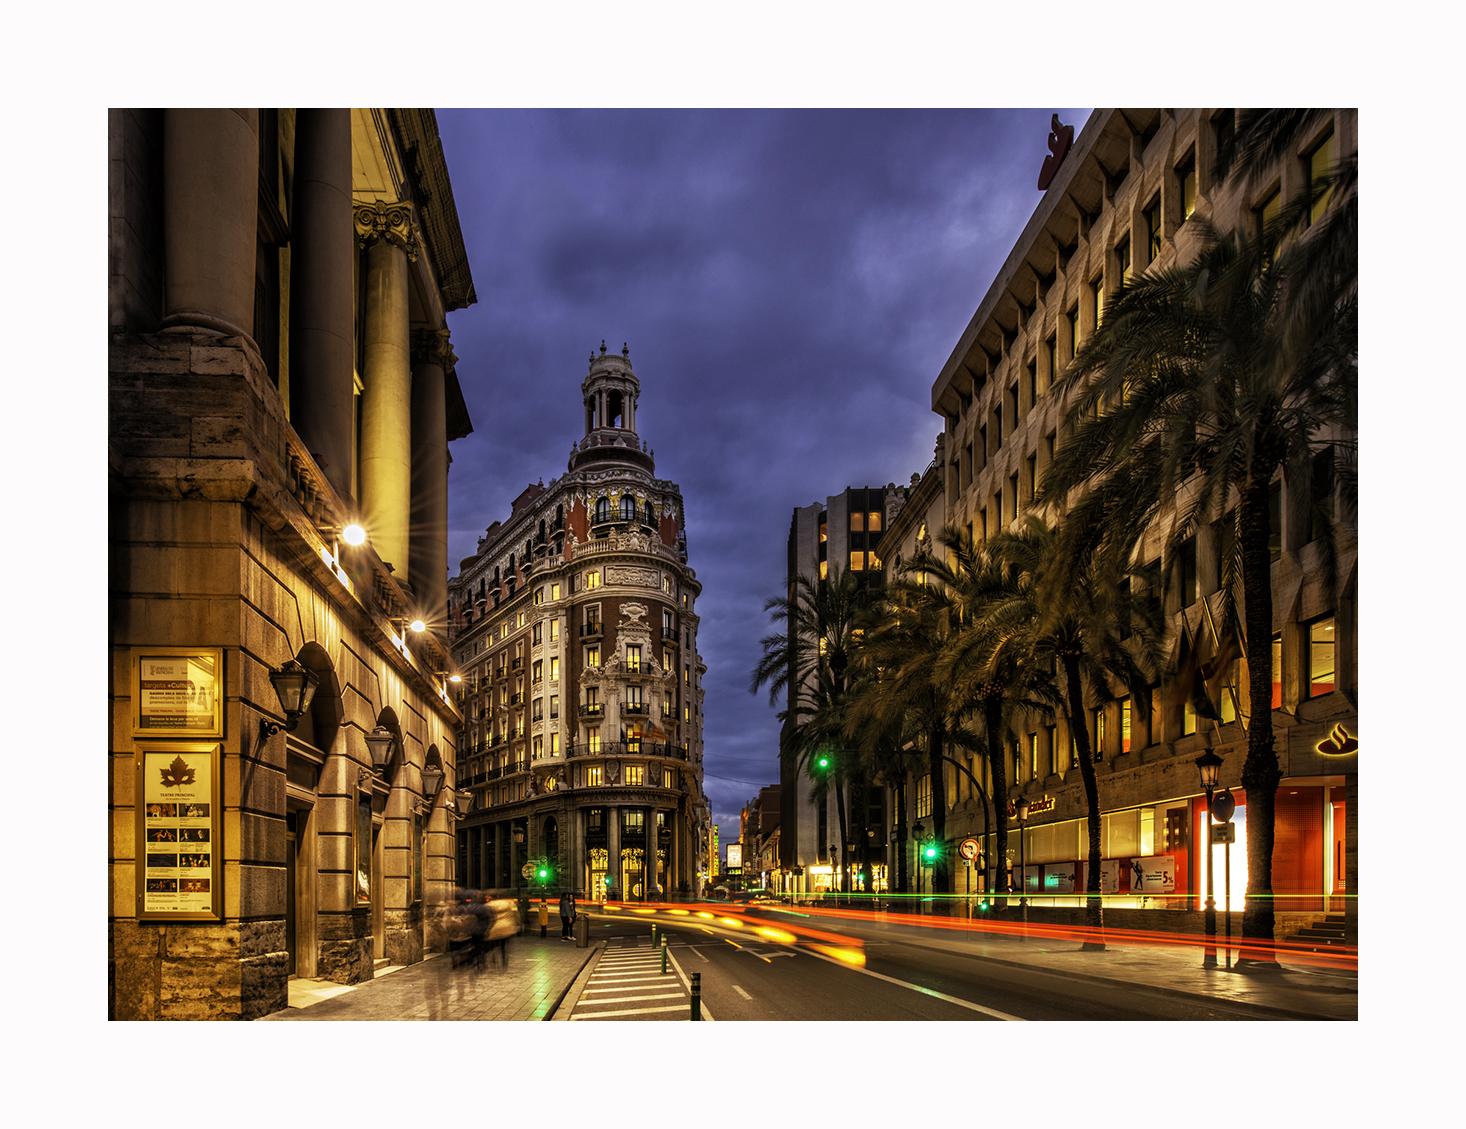 Banco de Valencia during blue hour, Spain